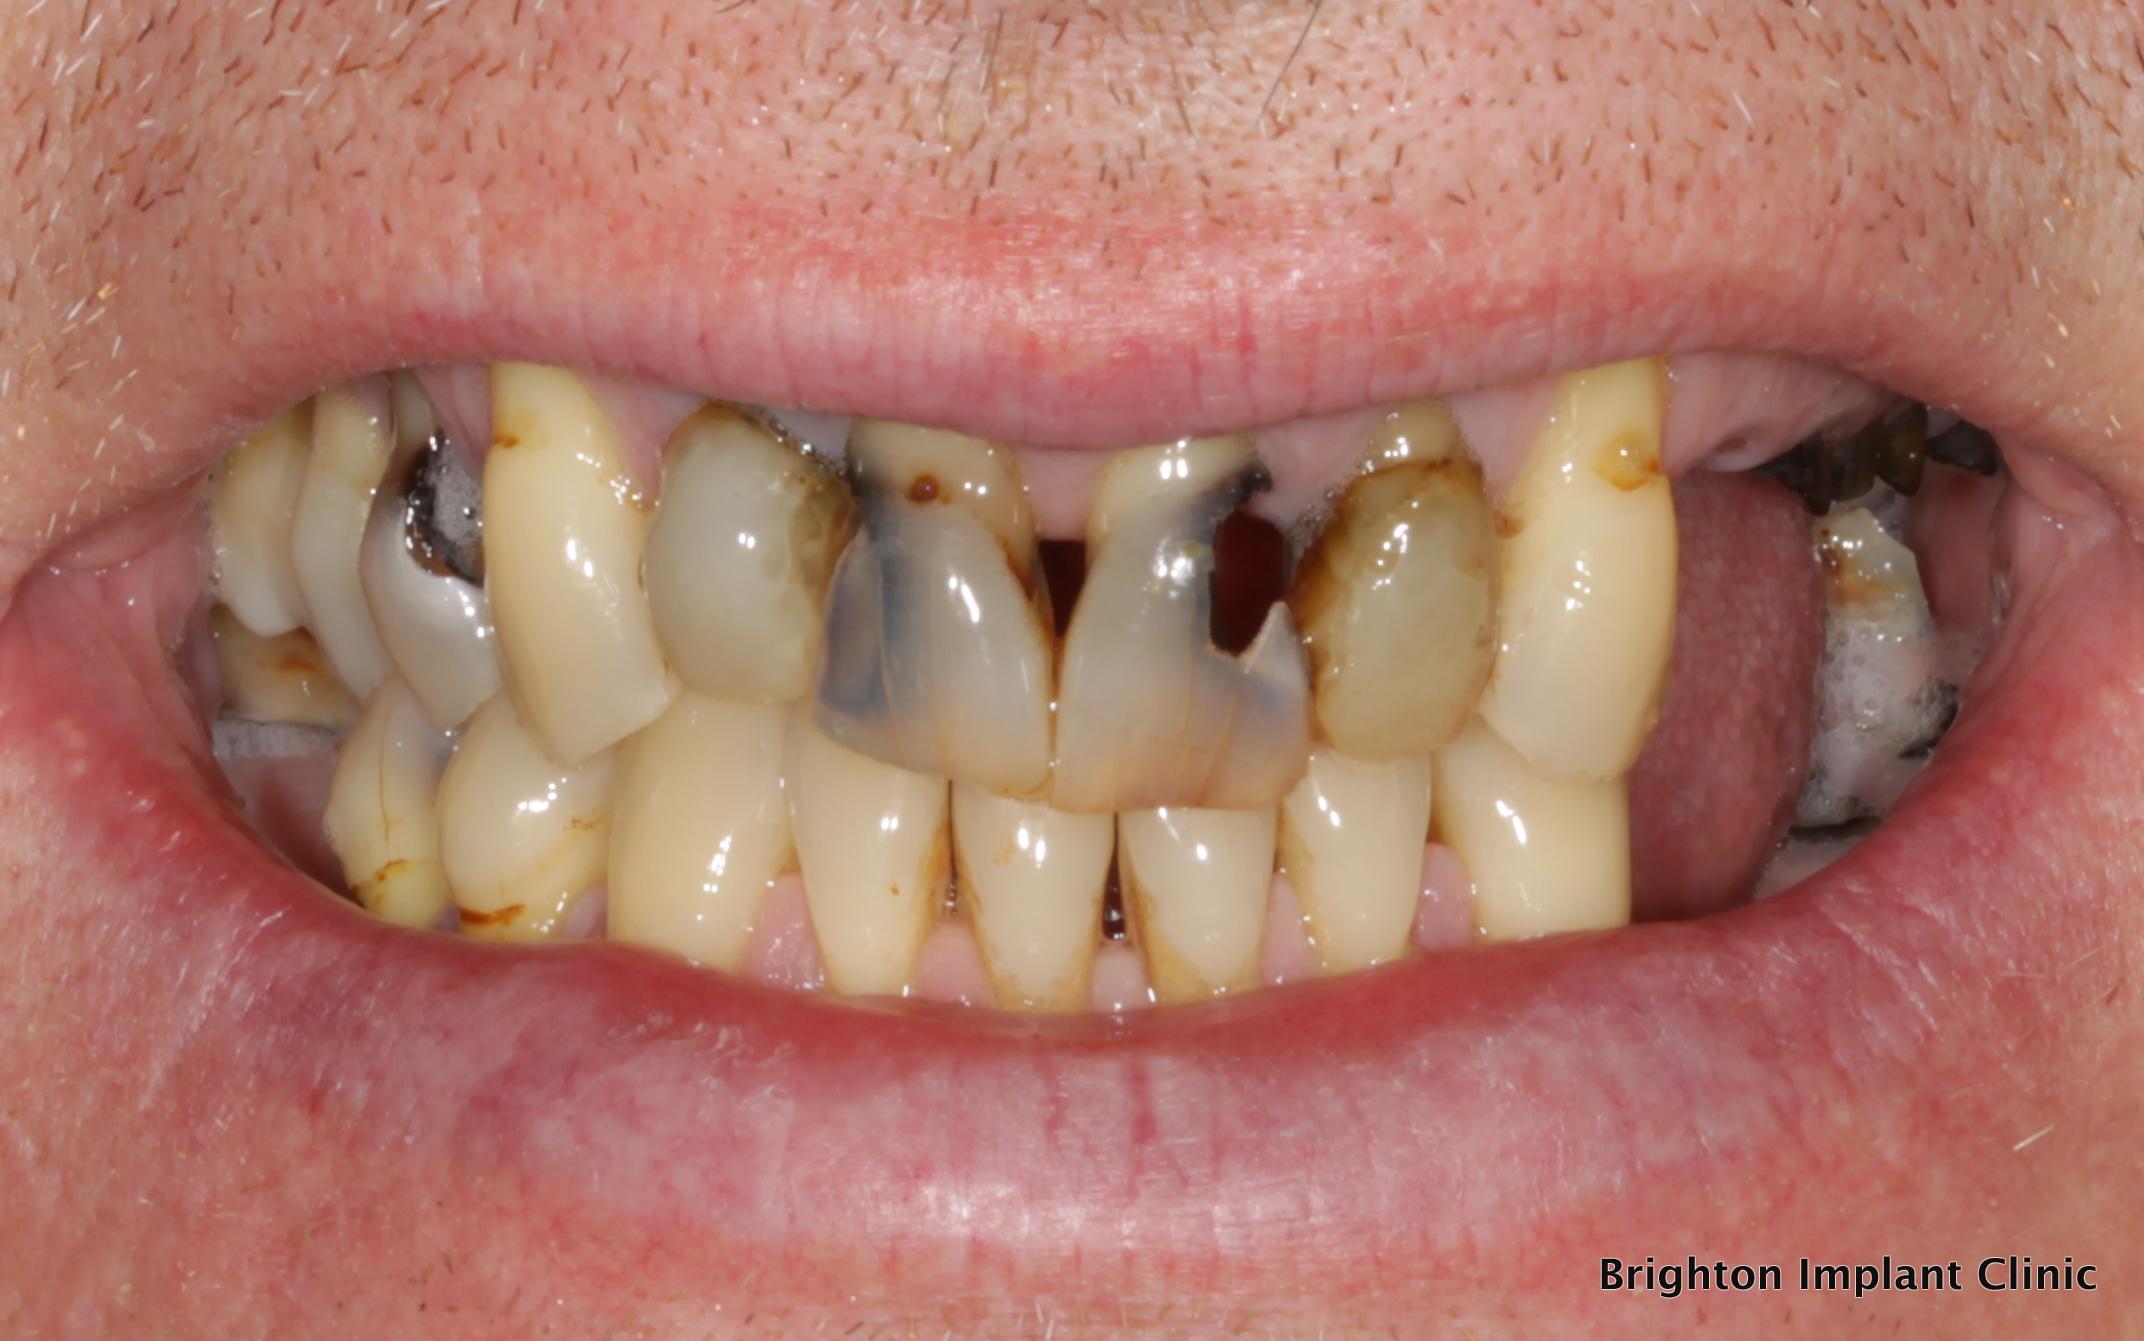 Dental decay seen on multiple teeth